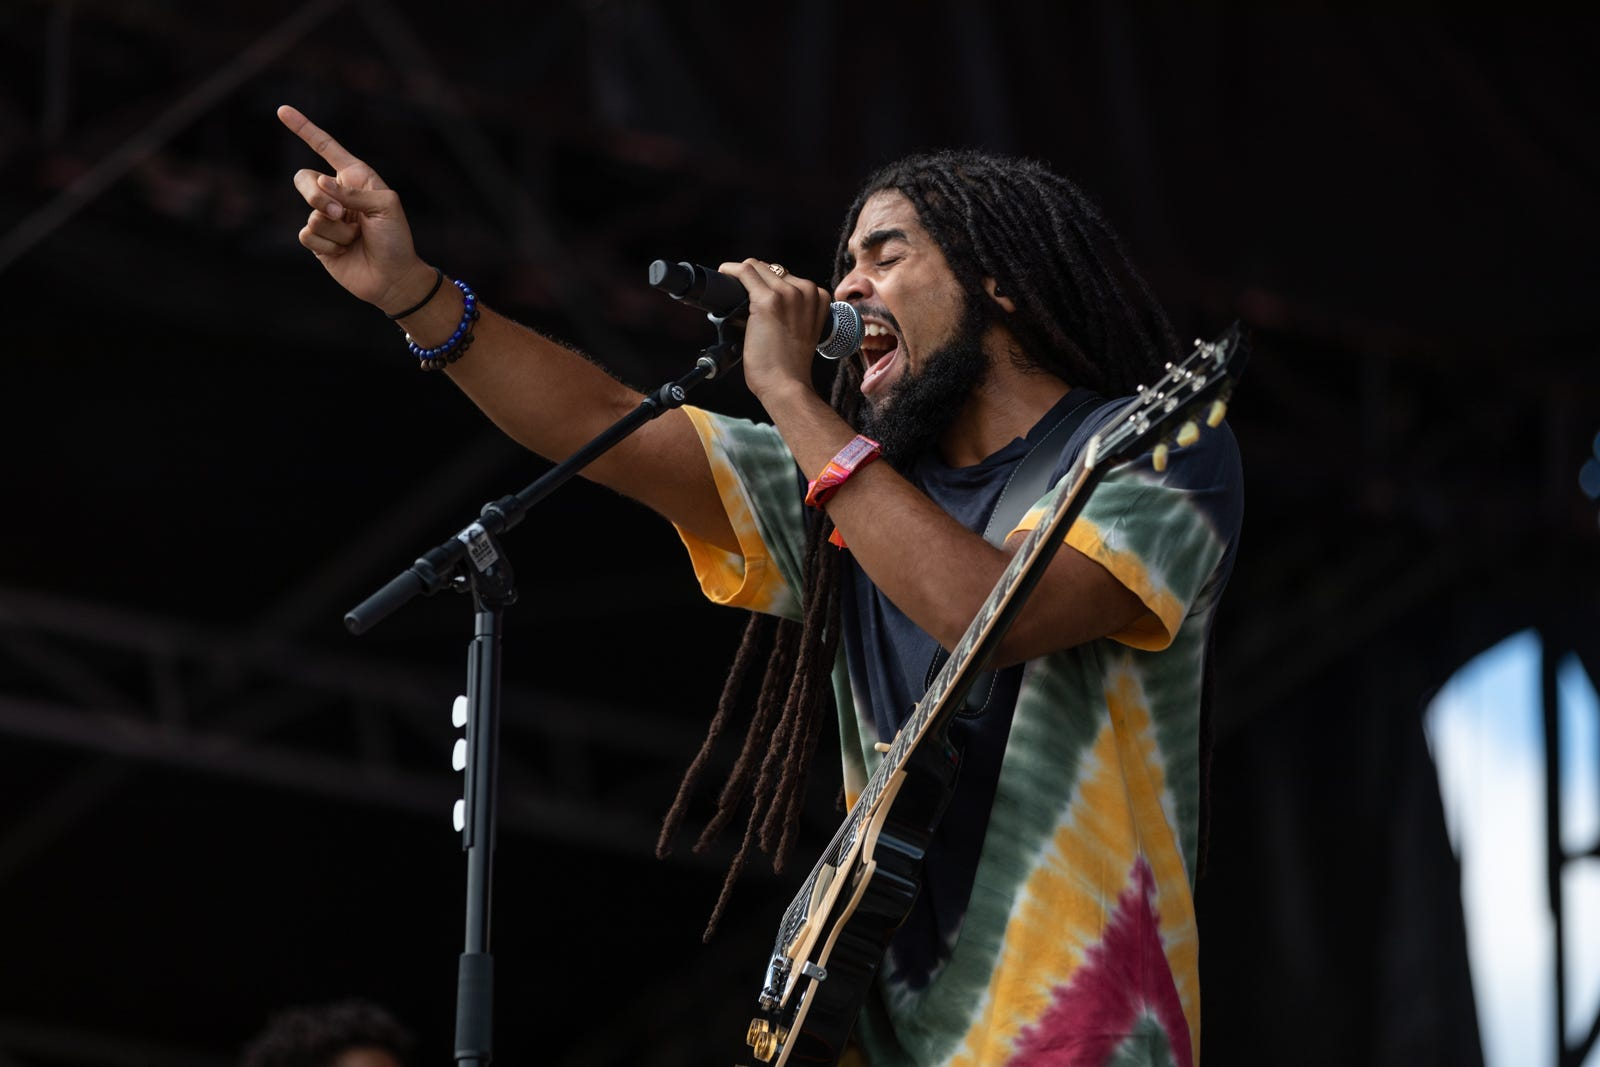 Skip Marley, Bob s grandson, gives ACL Fest the royal reggae treatment